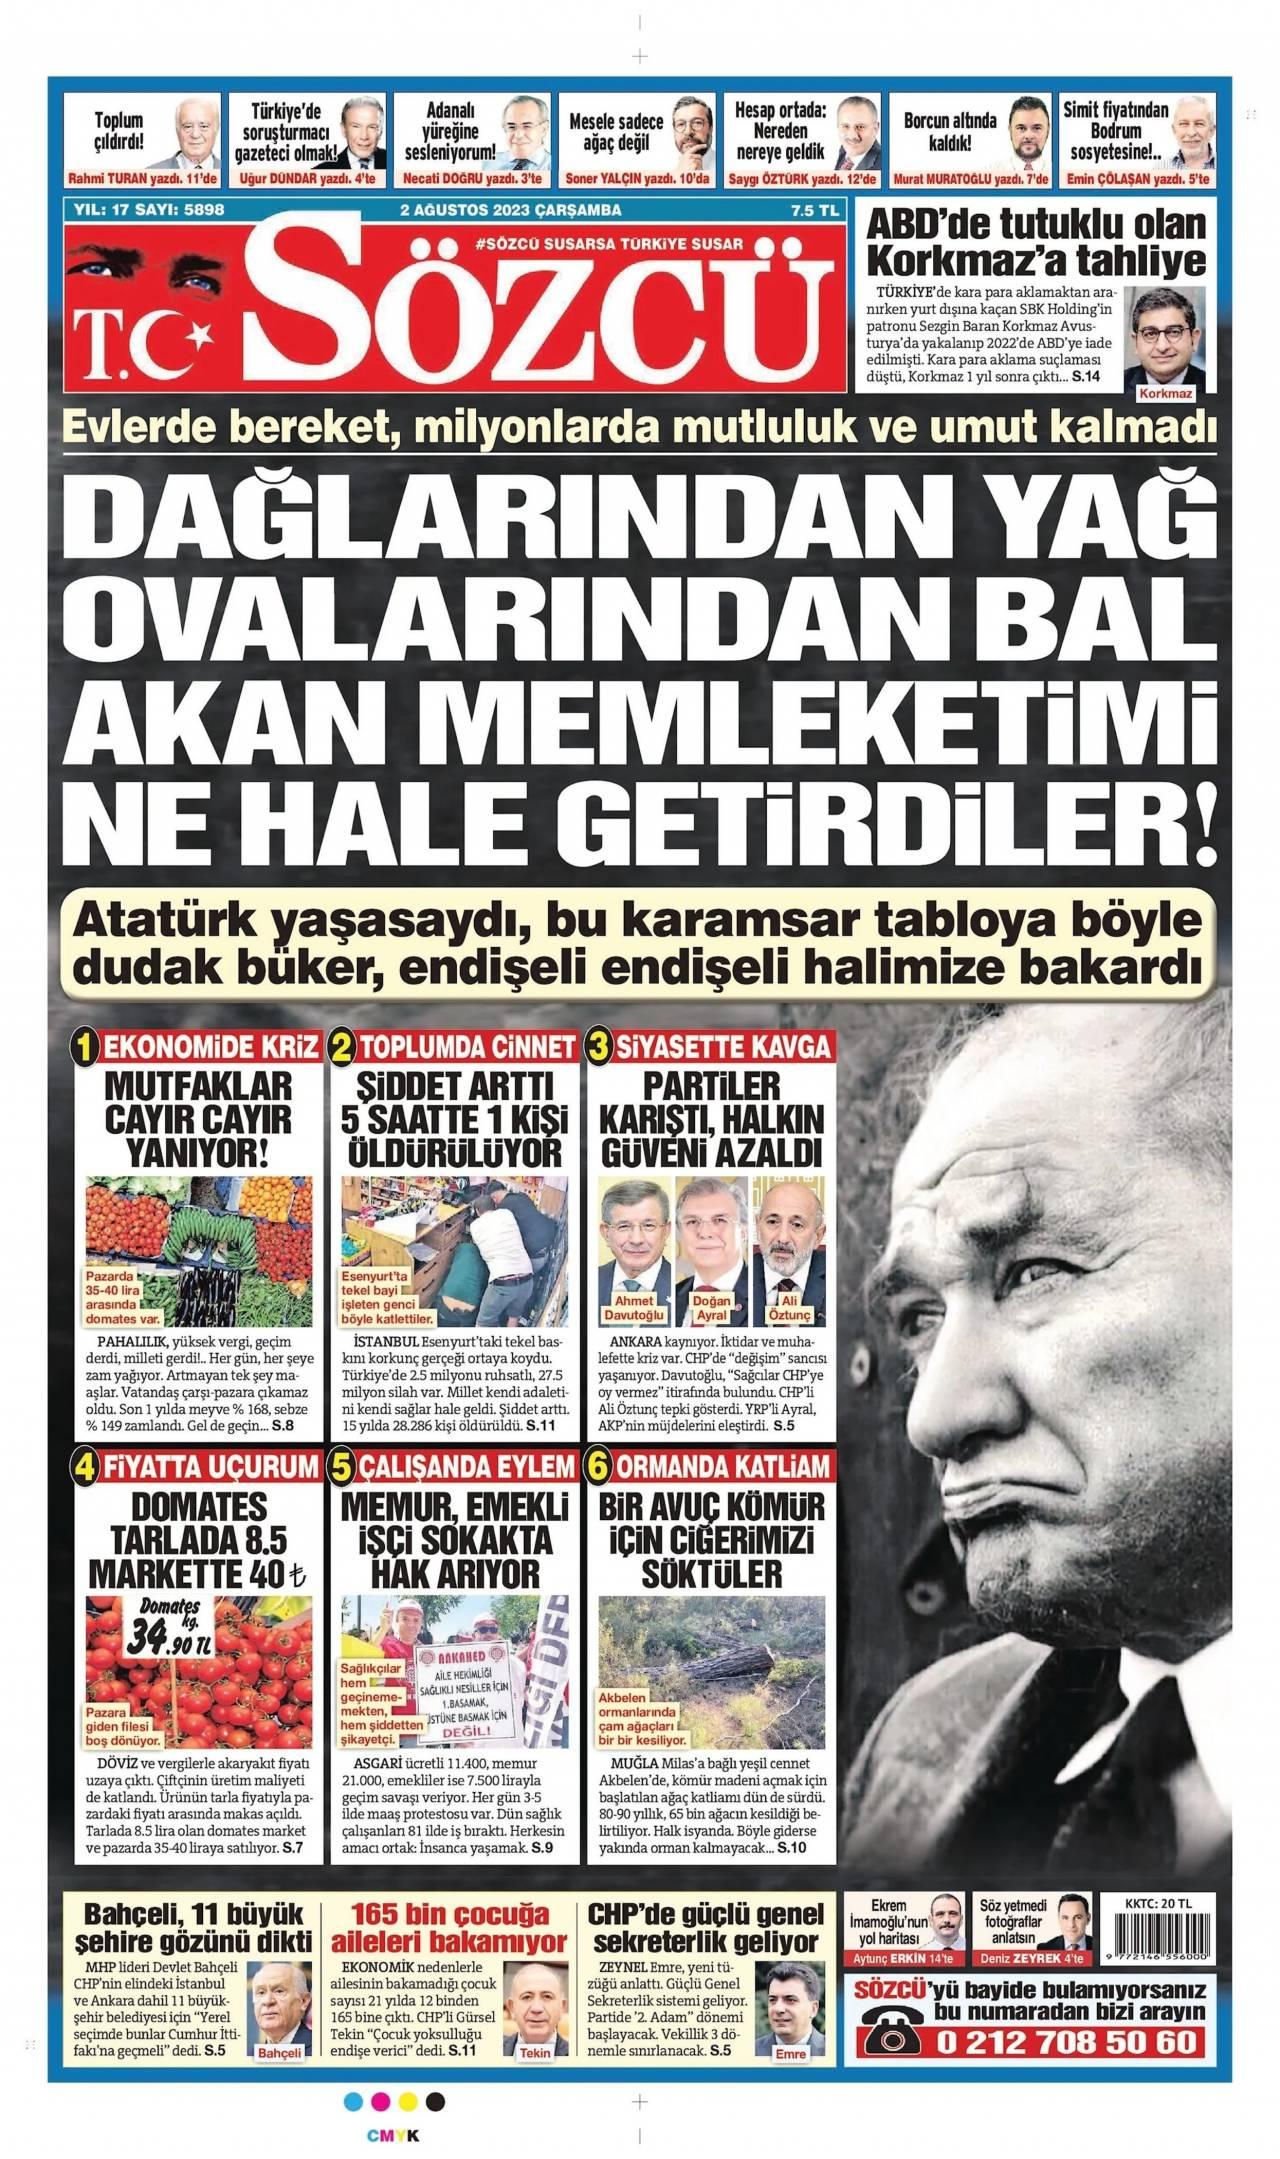 5 Ağustos 2020, Çarşamba sozcu Gazetesi